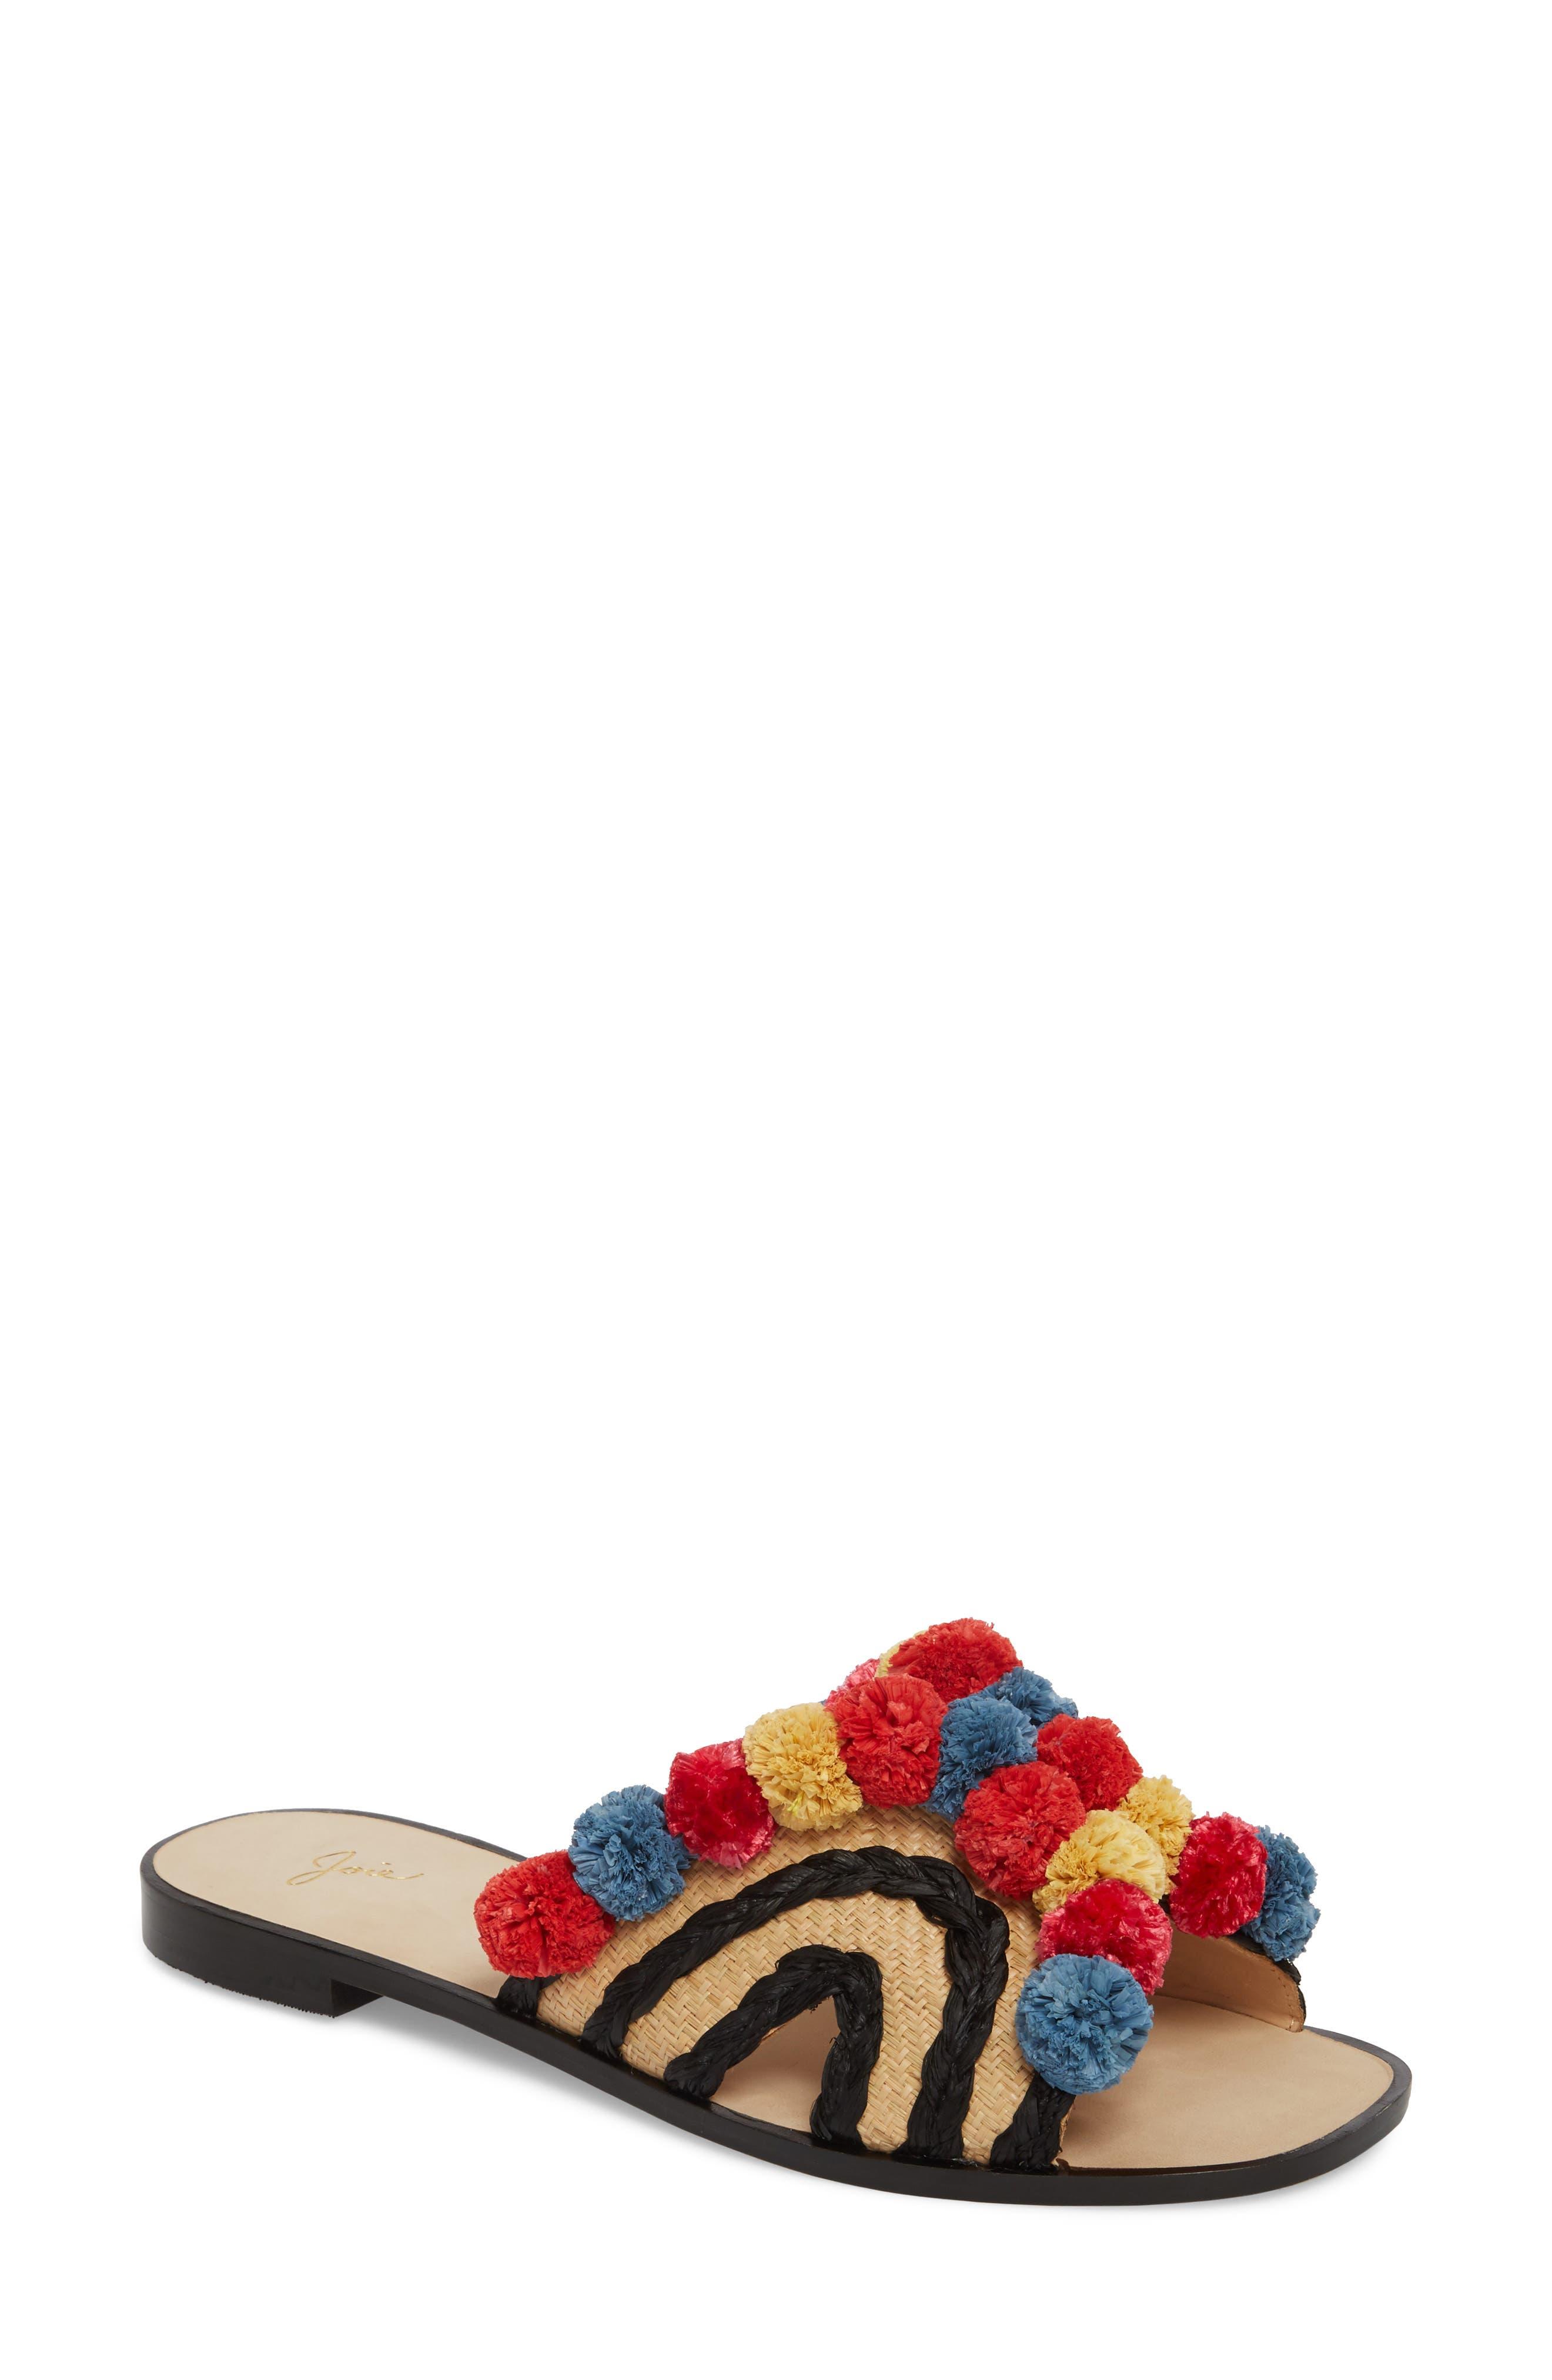 Paden Pompom Slide Sandals,                             Main thumbnail 1, color,                             Multi